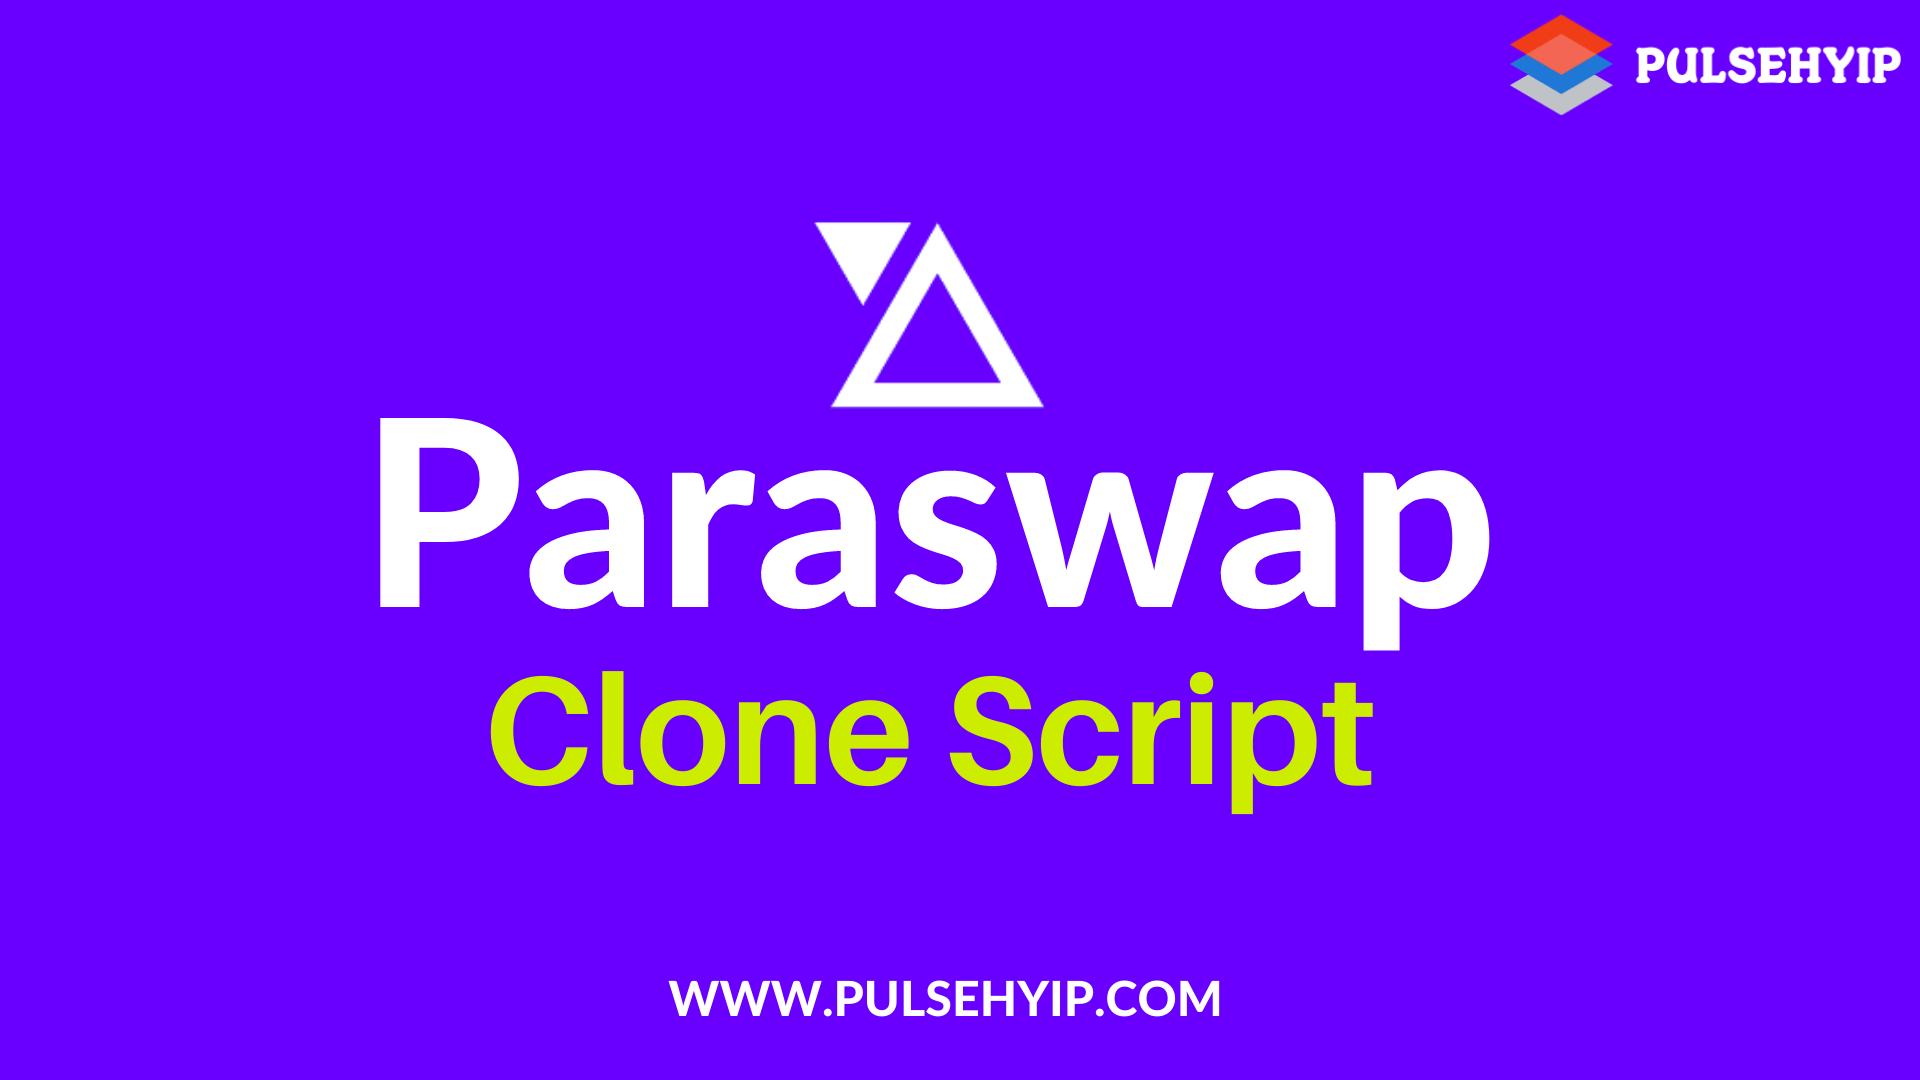 Paraswap Clone Script - Develop Your Own DeFi DEX Aggregator